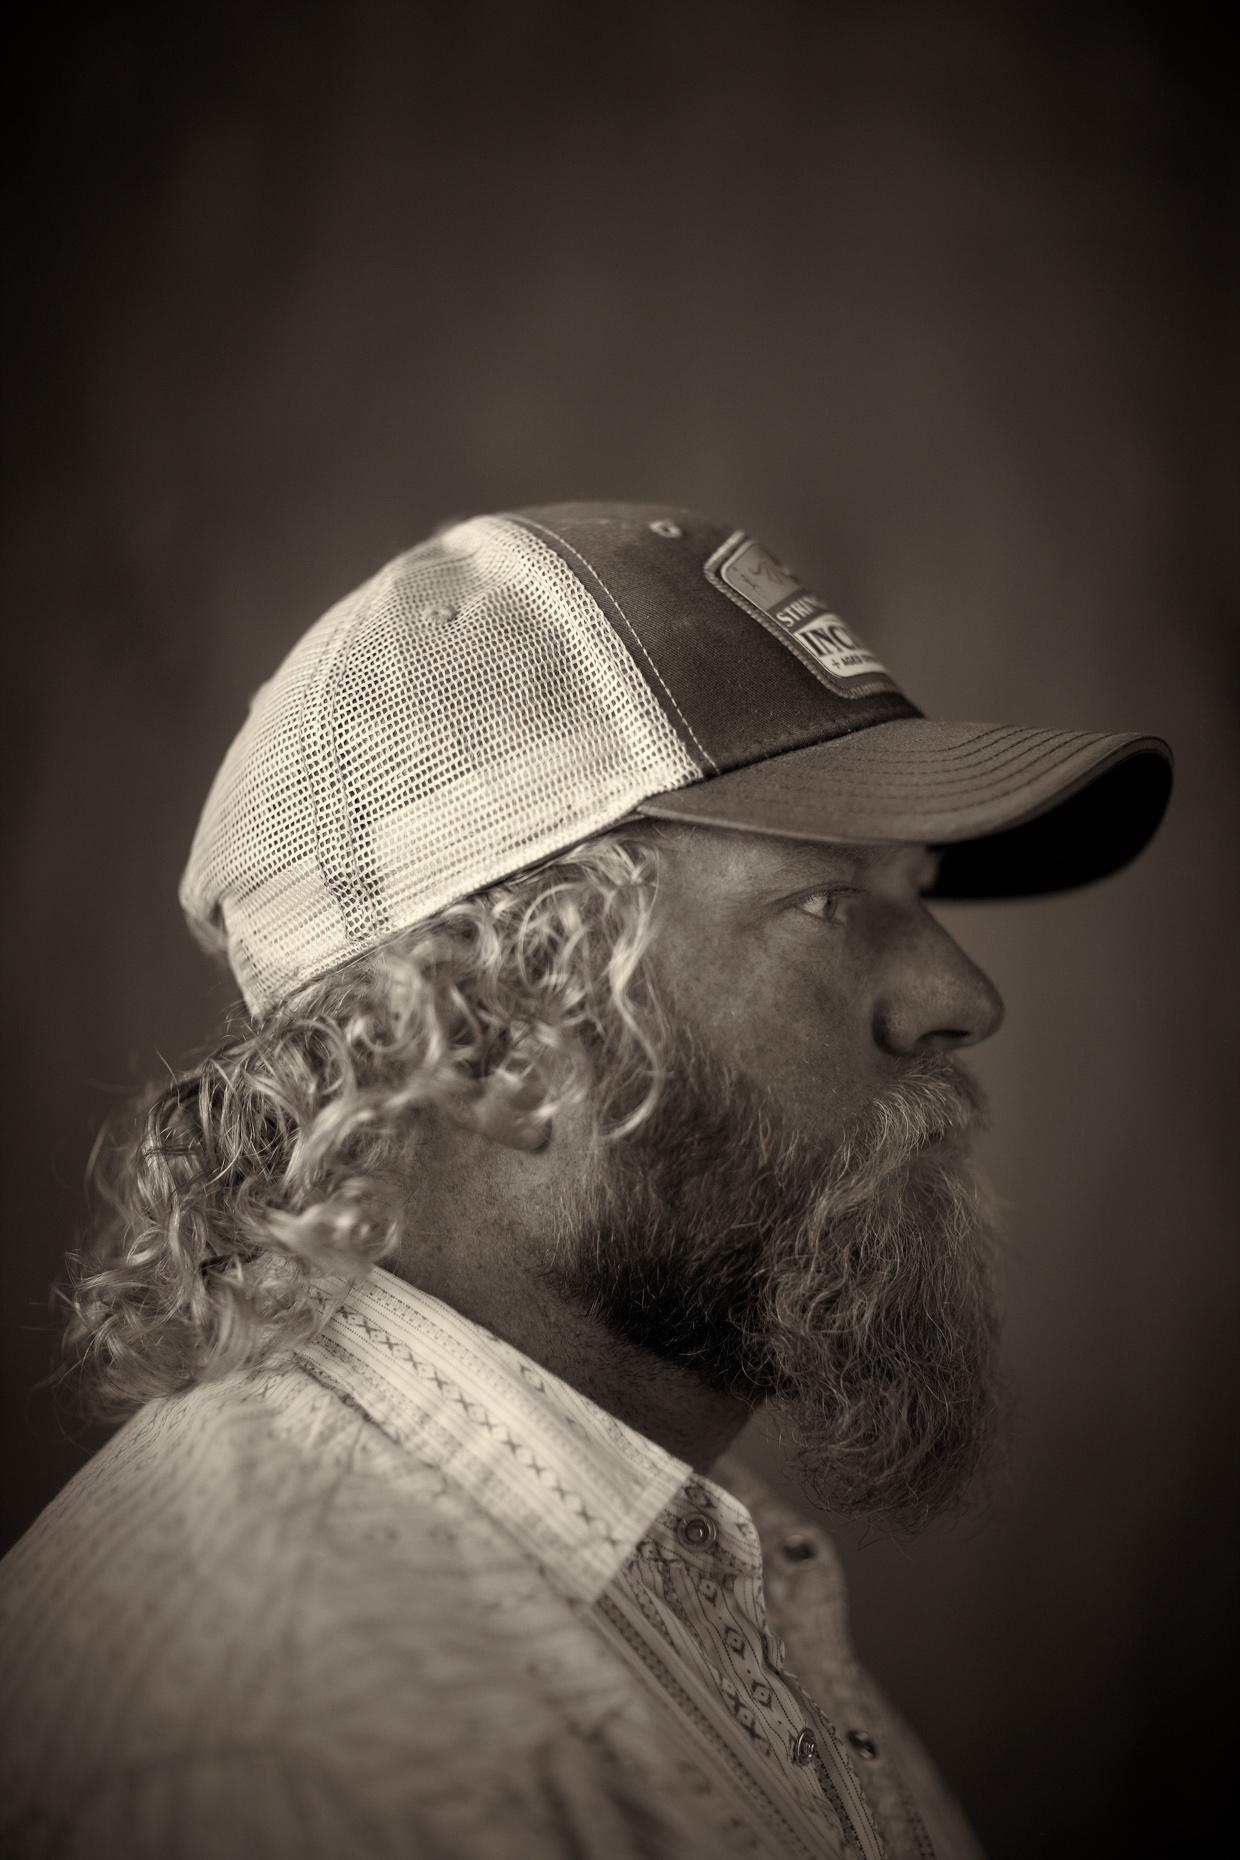 Portrait Photography Derek Israelsen Trucker Profile